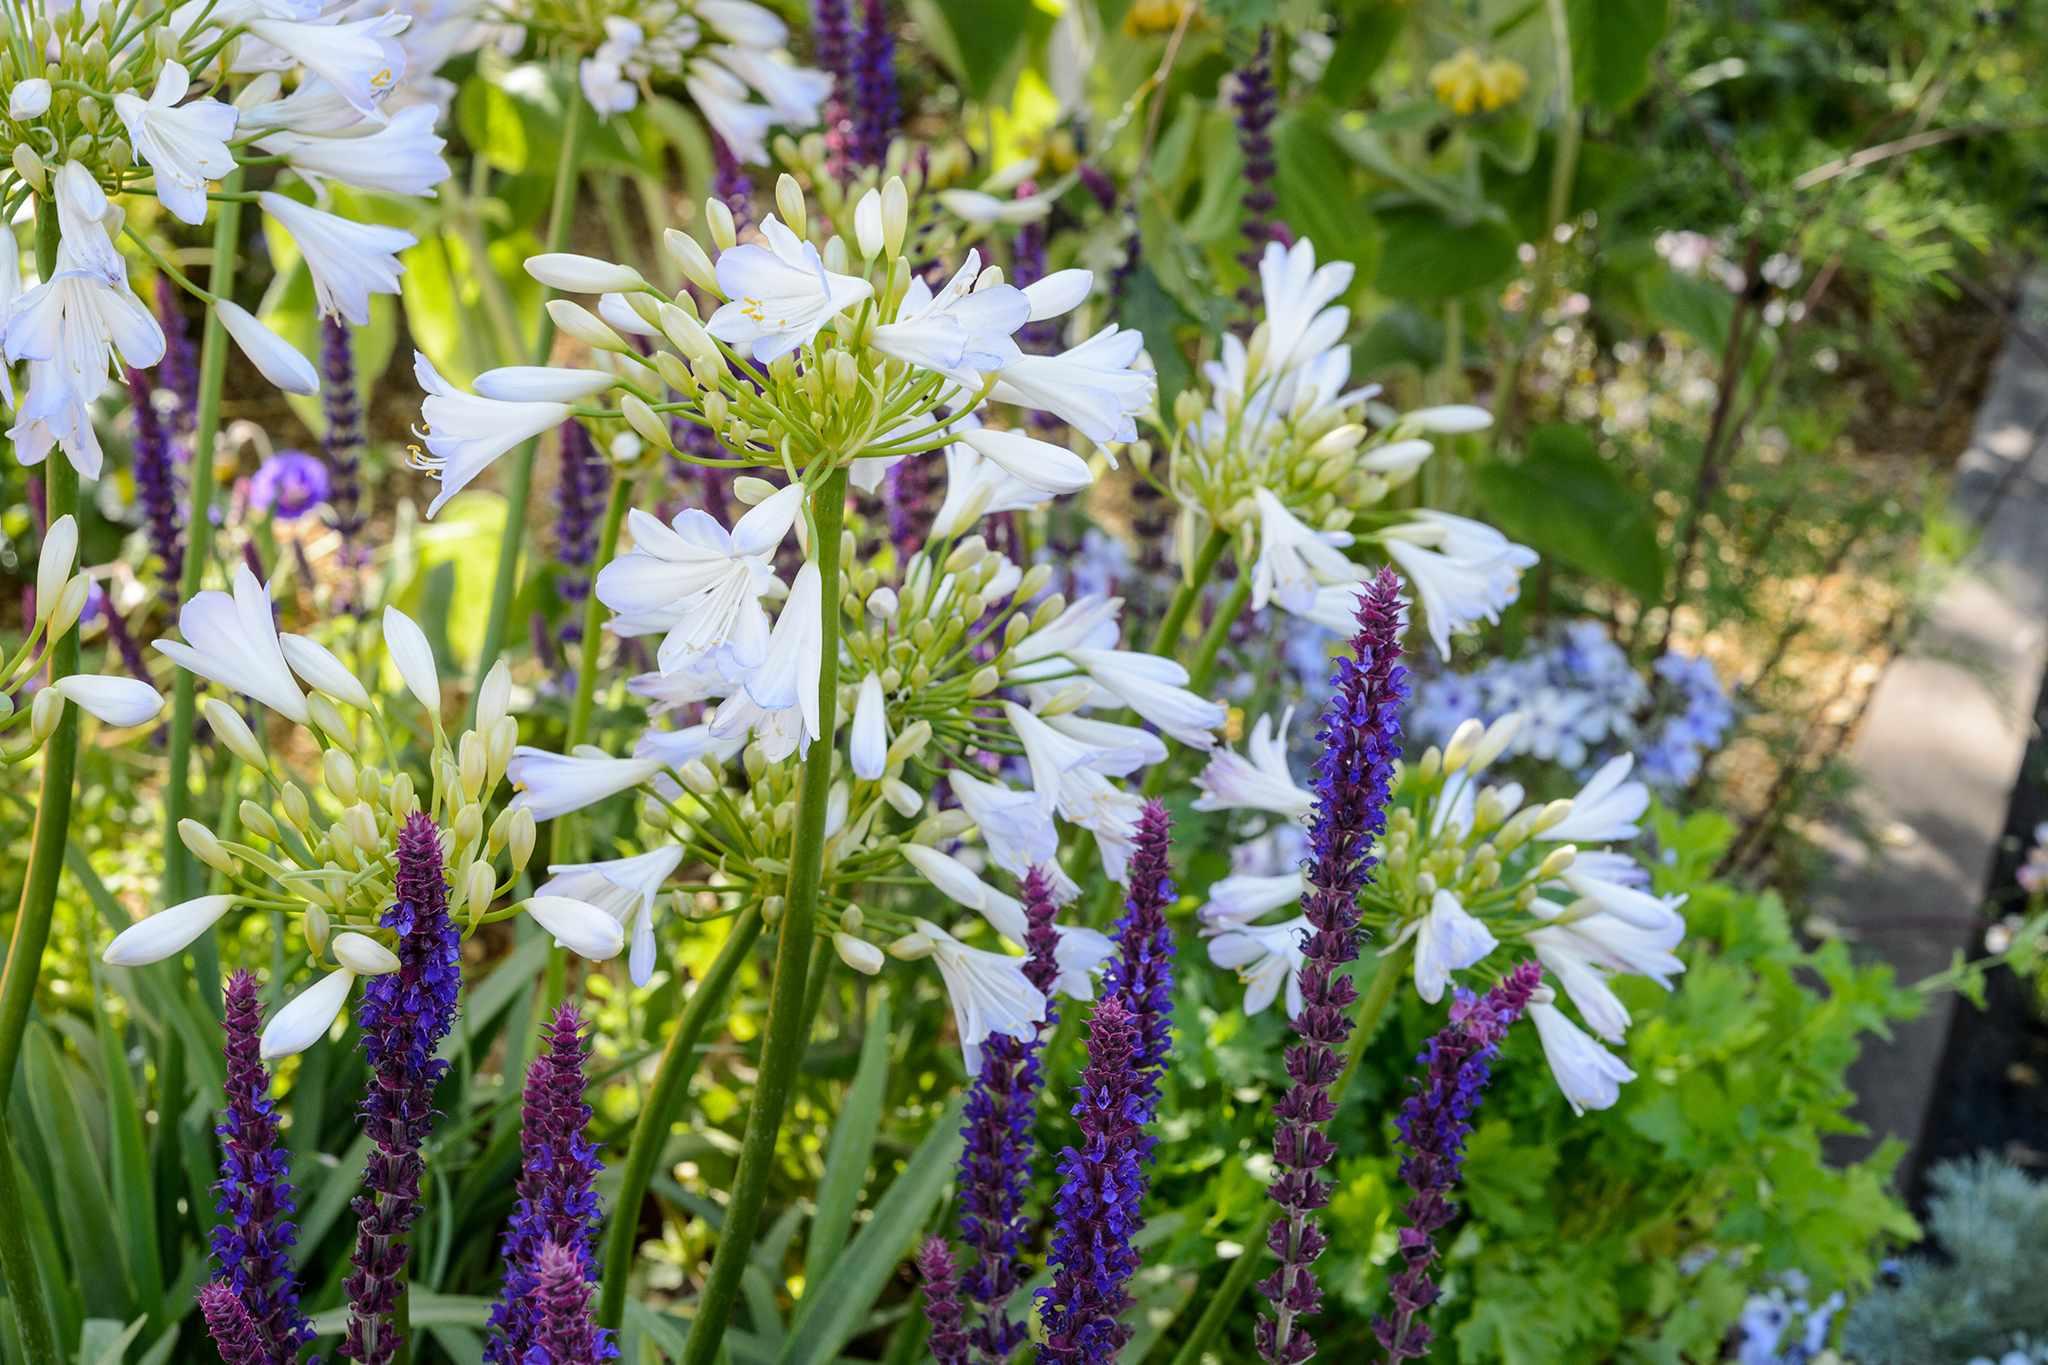 Agapanthus 'Silver Baby' with Salvia nemorosa